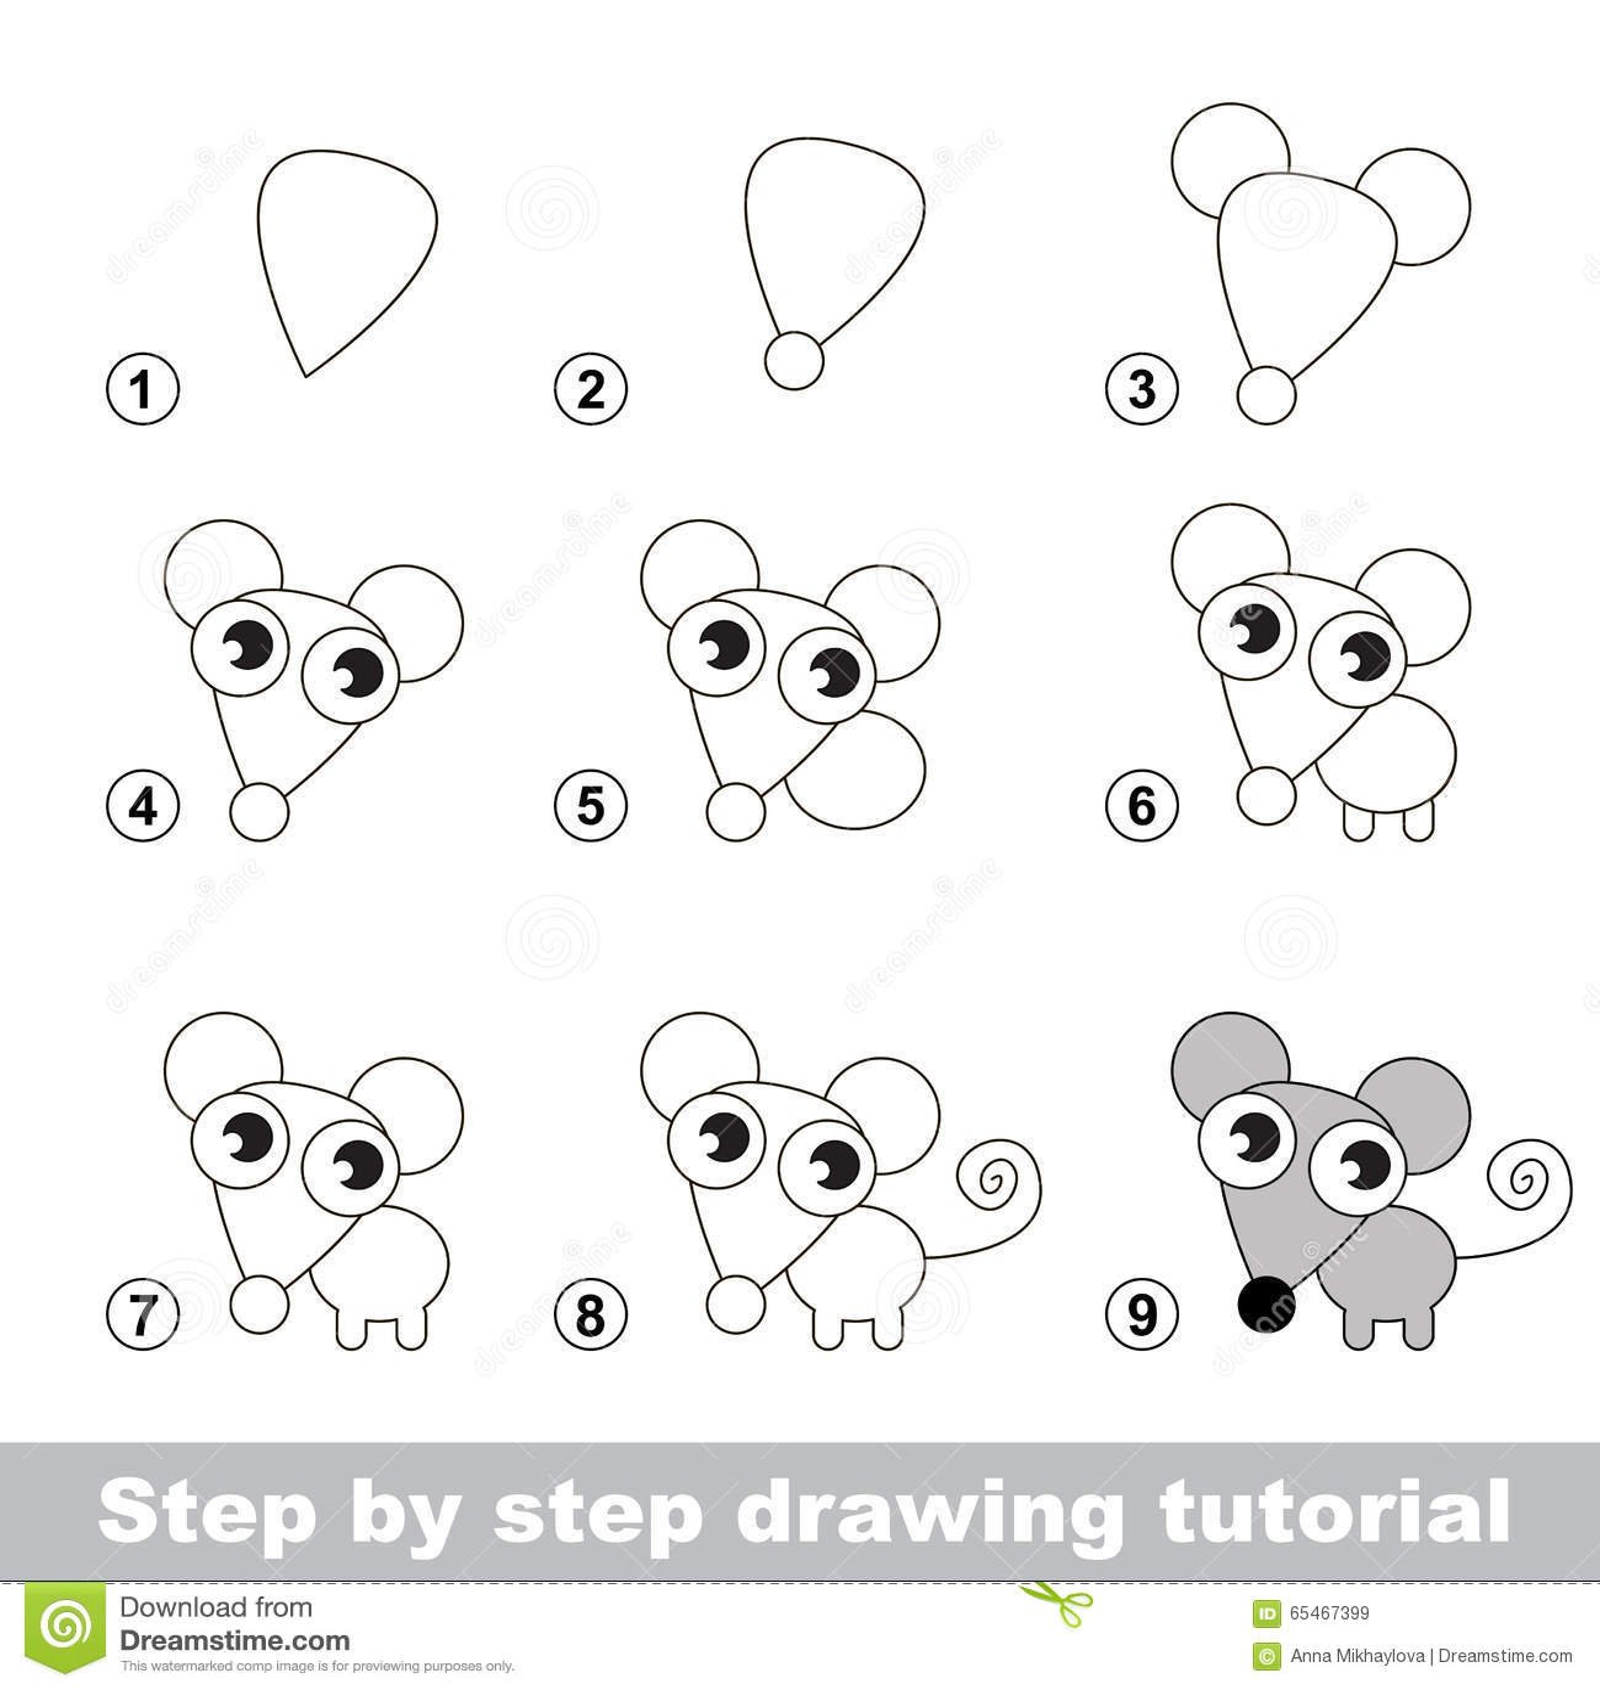 Tutorial Del Dibujo Como Dibujar Un Pequeno Raton